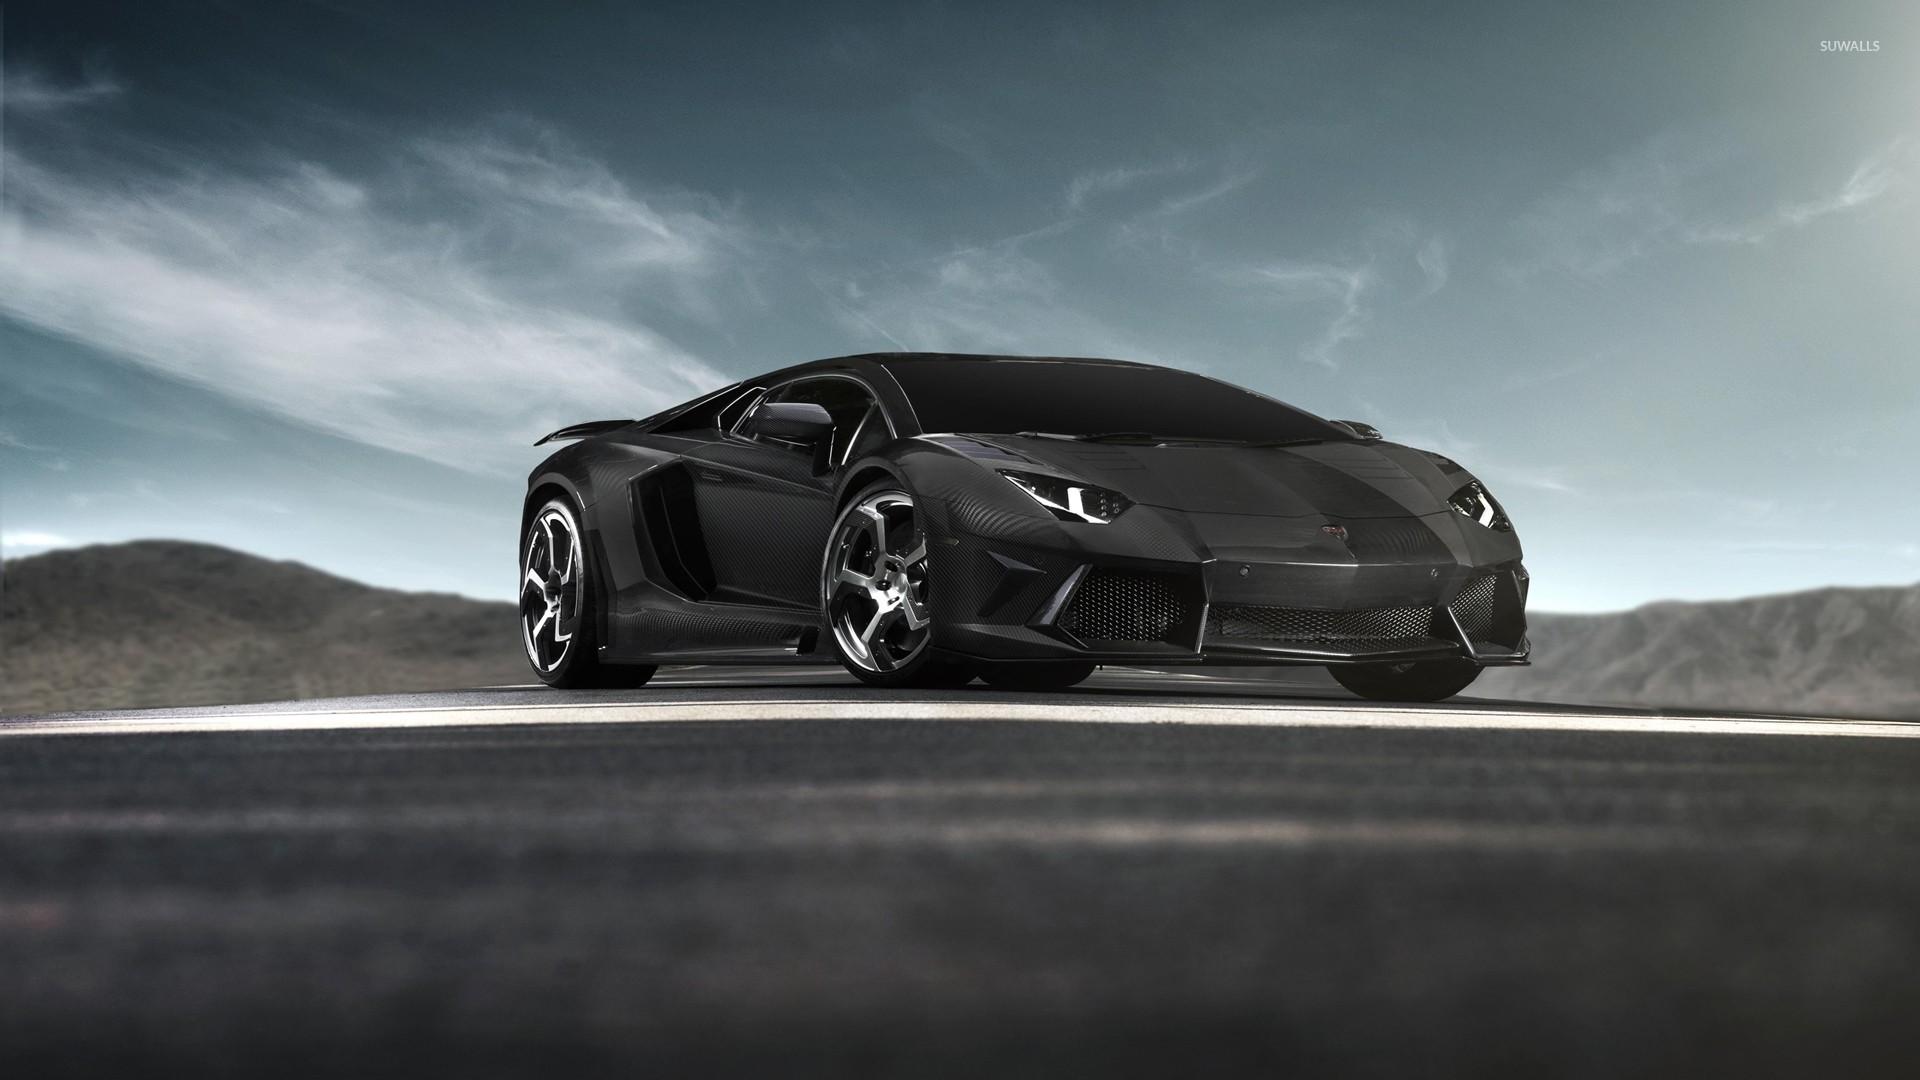 Black Lamborghini Wallpaper 72 Images